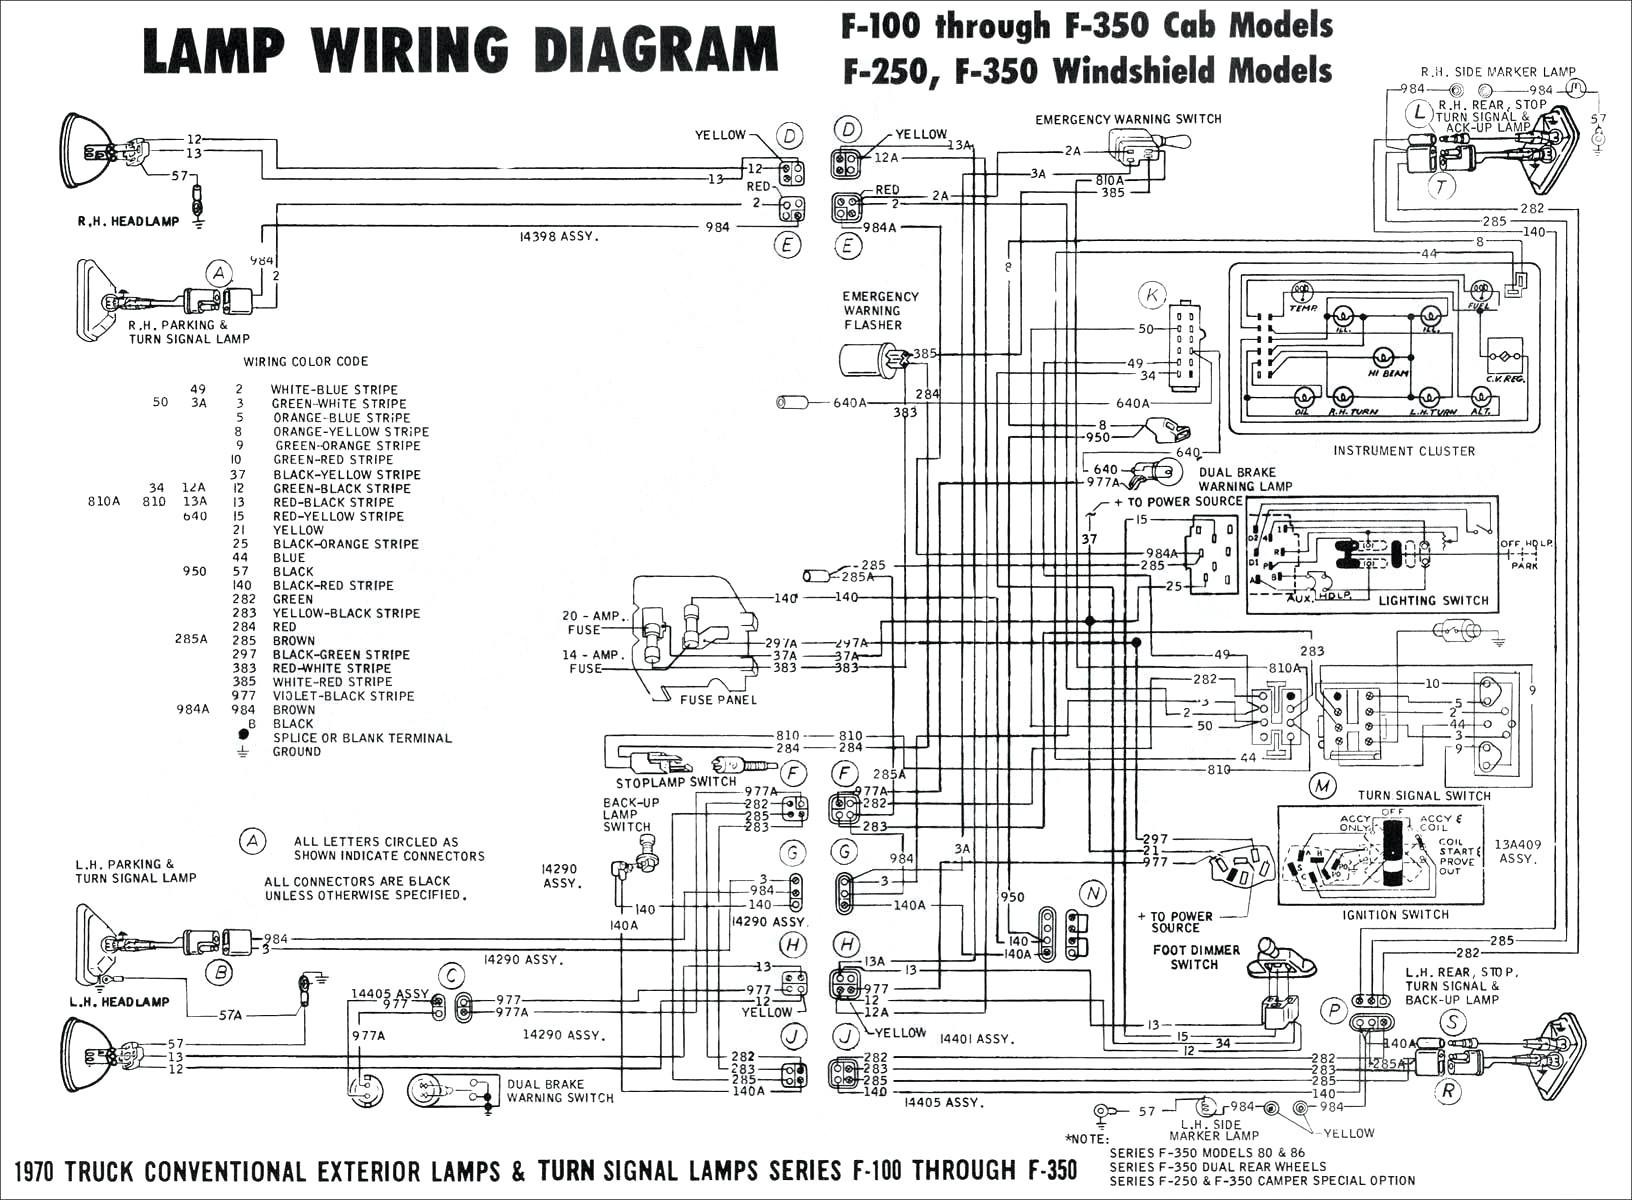 Mini Cooper Engine Bay Diagram 2002 Mini Wiring Diagram Of Mini Cooper Engine Bay Diagram